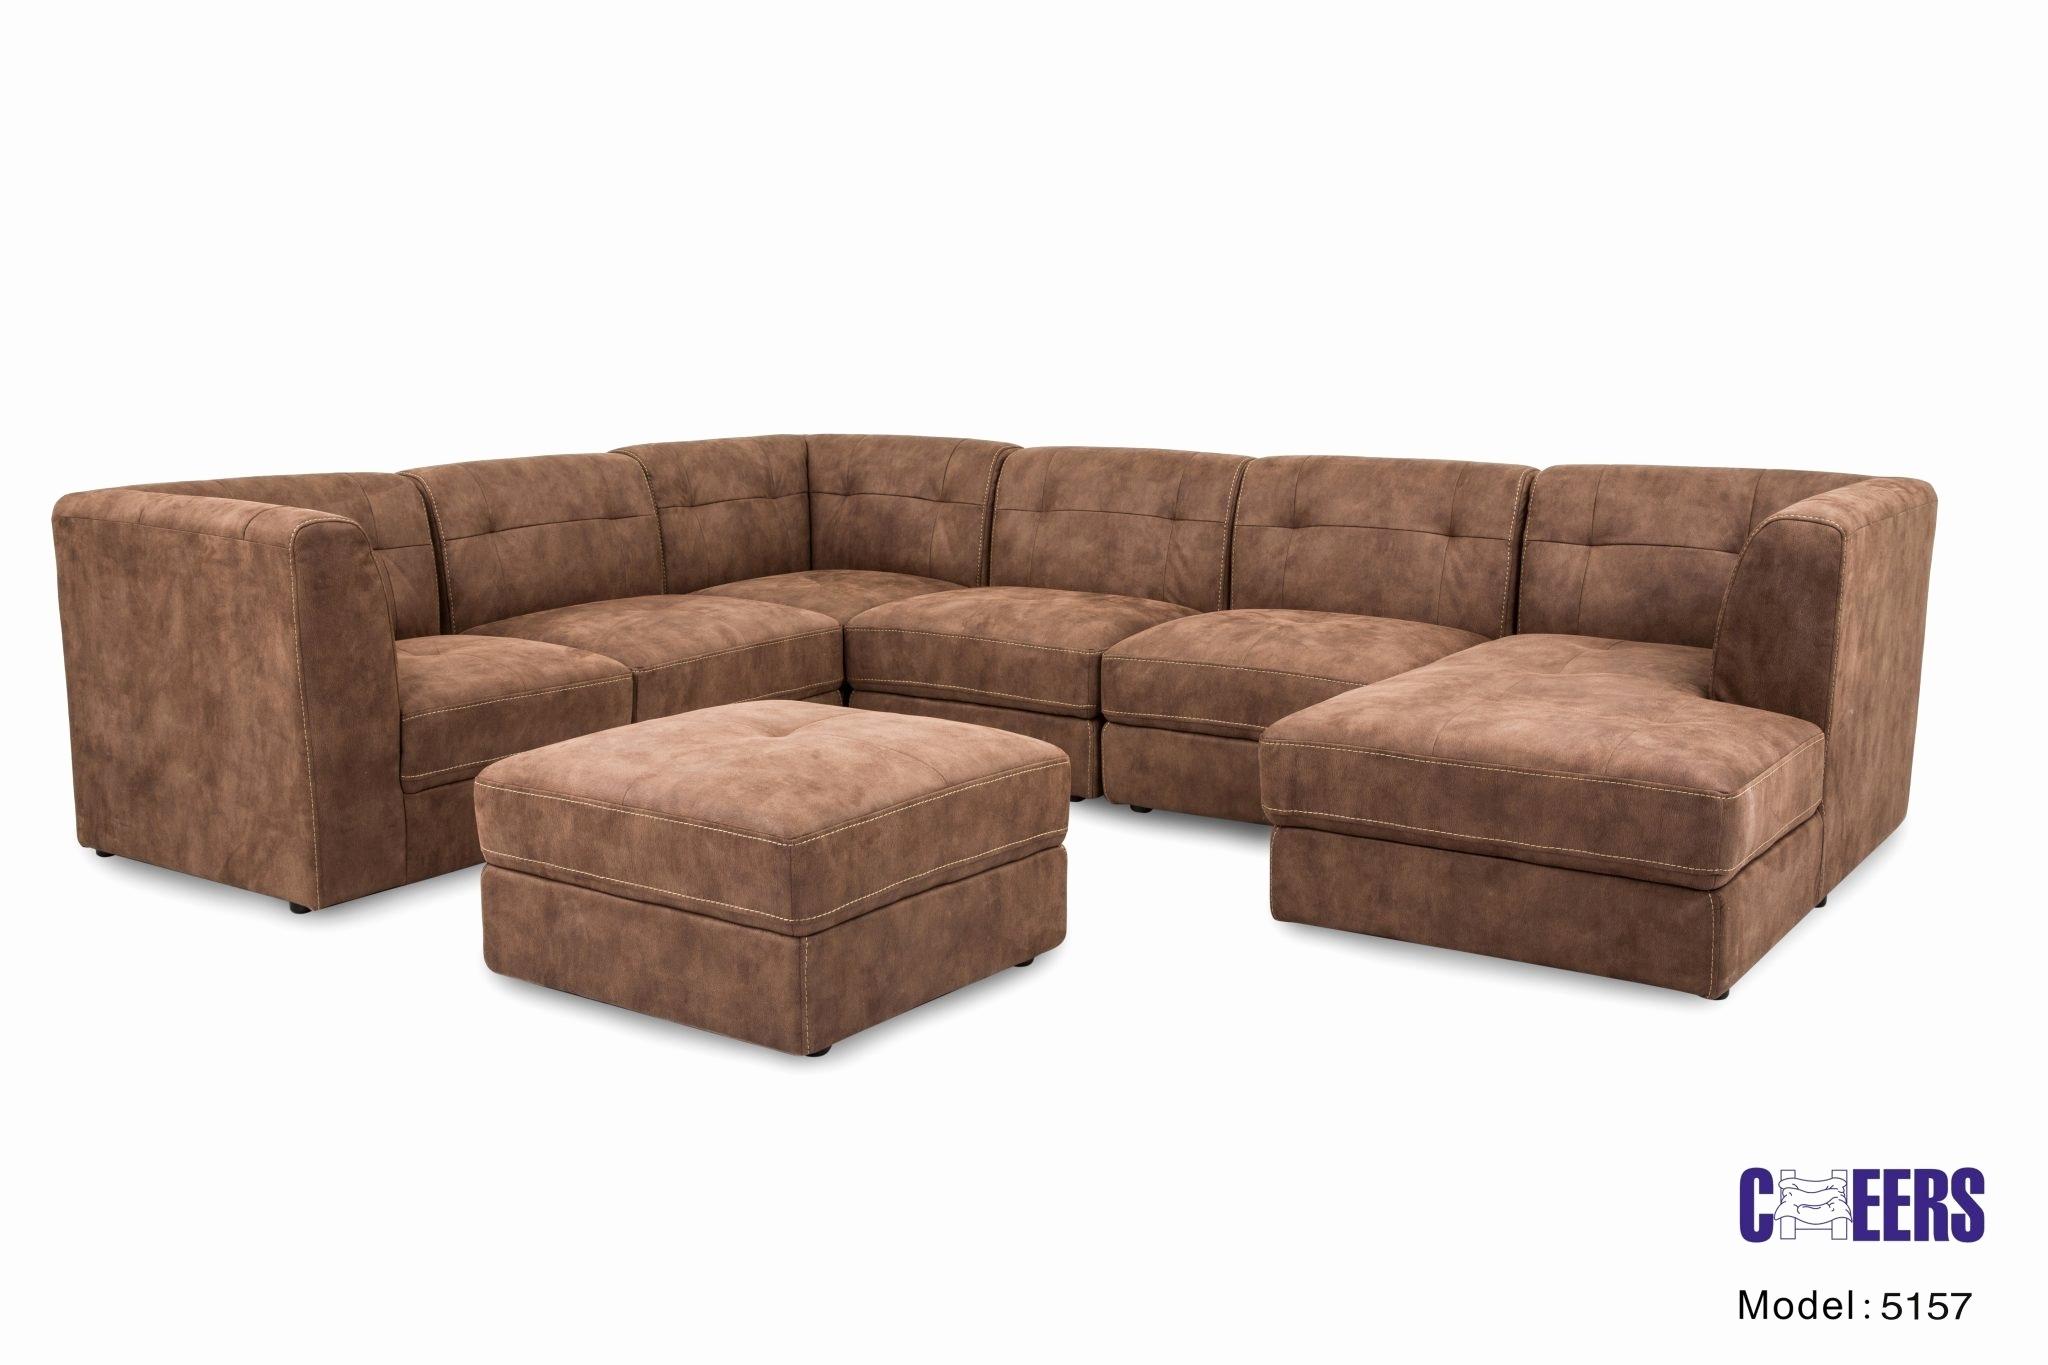 Luxury 6 Piece Sectional Sofa 2018 – Couches Ideas Regarding Sam Levitz Sectional Sofas (View 8 of 10)